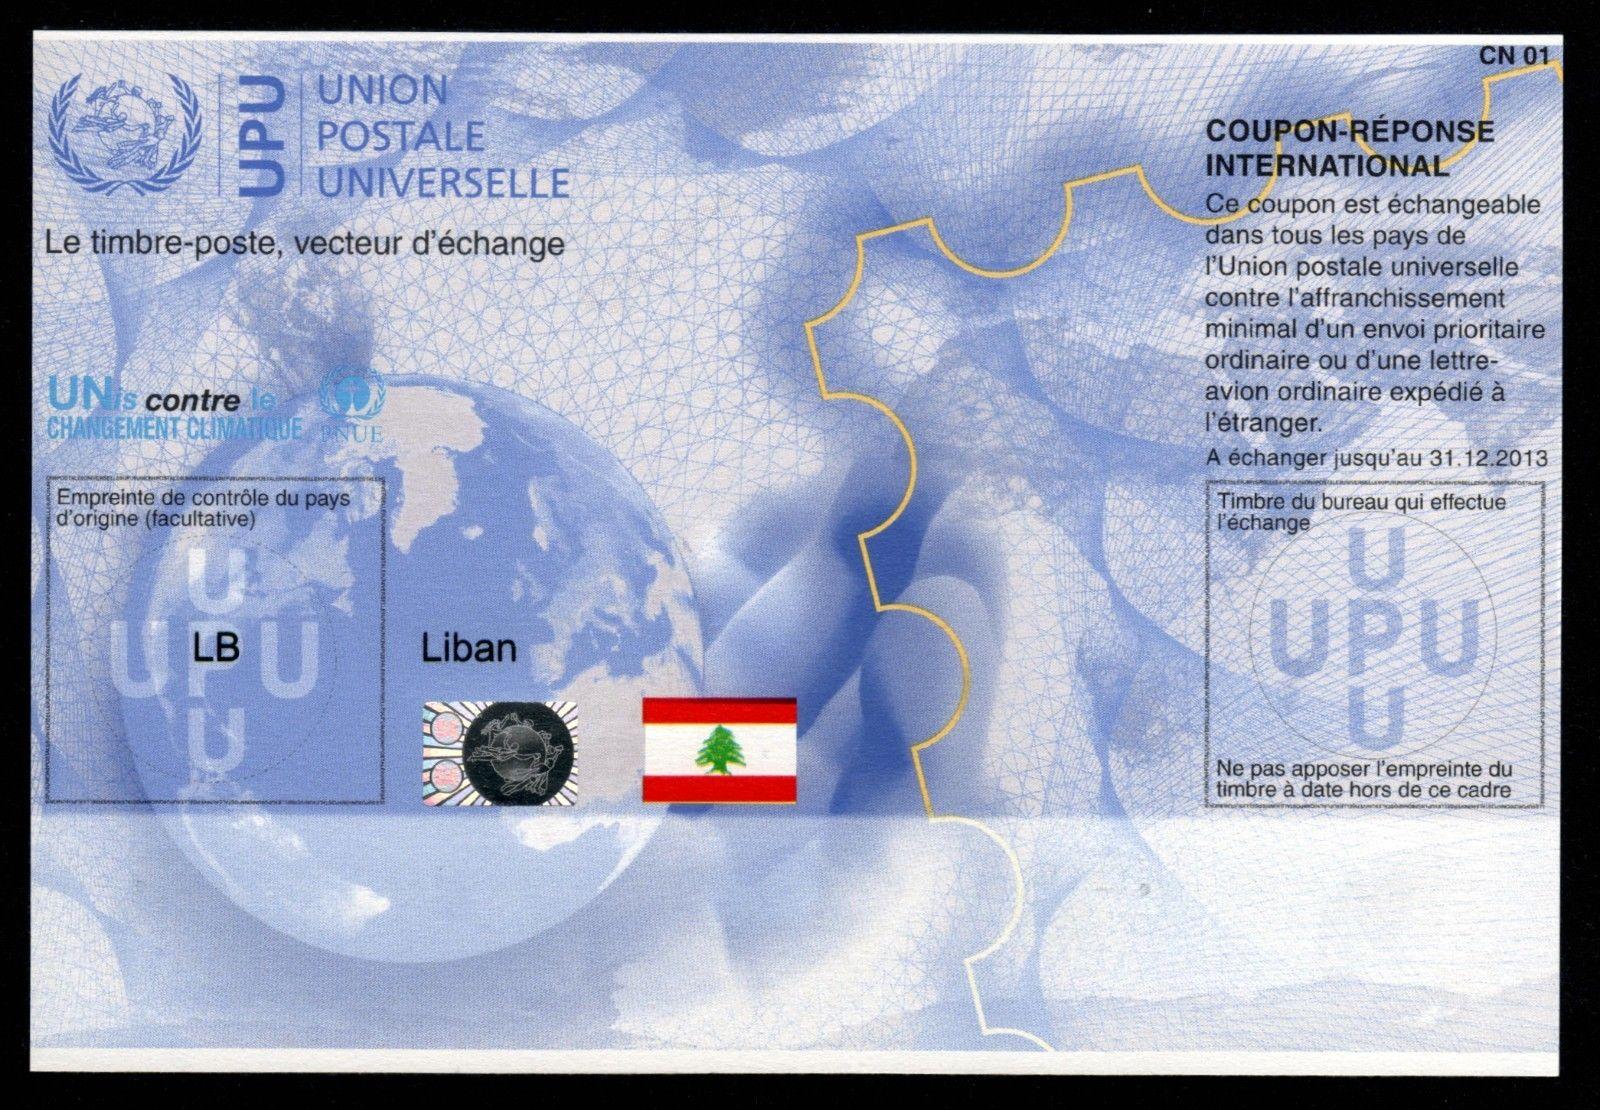 2013 IRC International Hologram Flag Reply coupon IRC UPU Front 141225217520